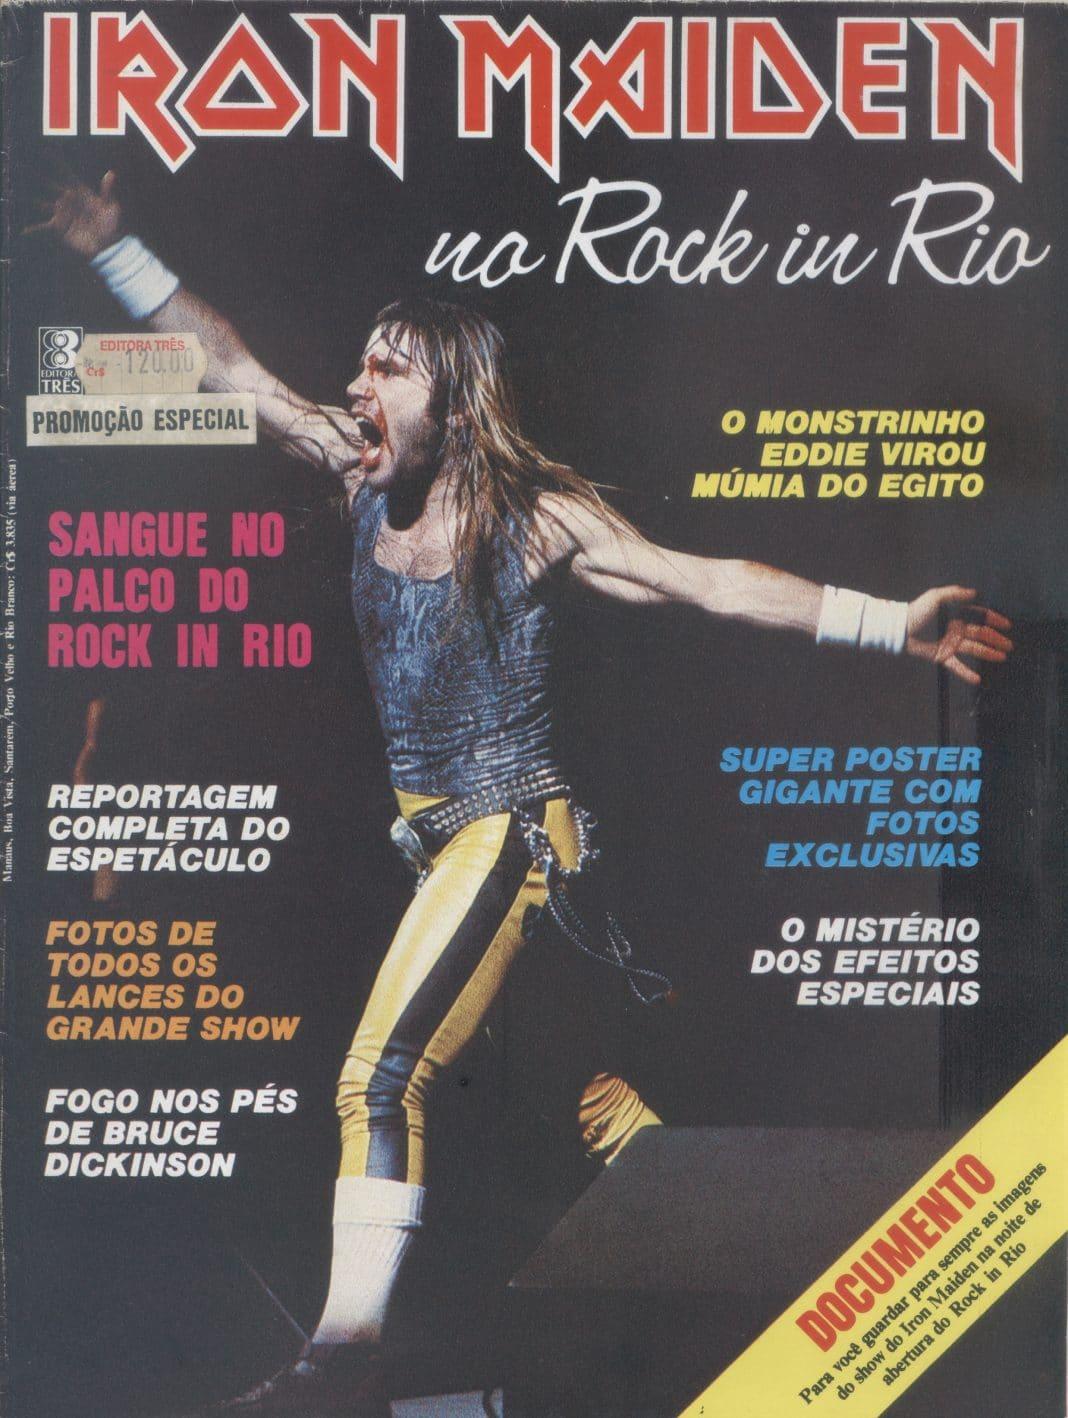 IRON MAIDEN: Cuando BRUCE DICKINSON apareció ensangrentado en Rock In Rio '85 (Video)